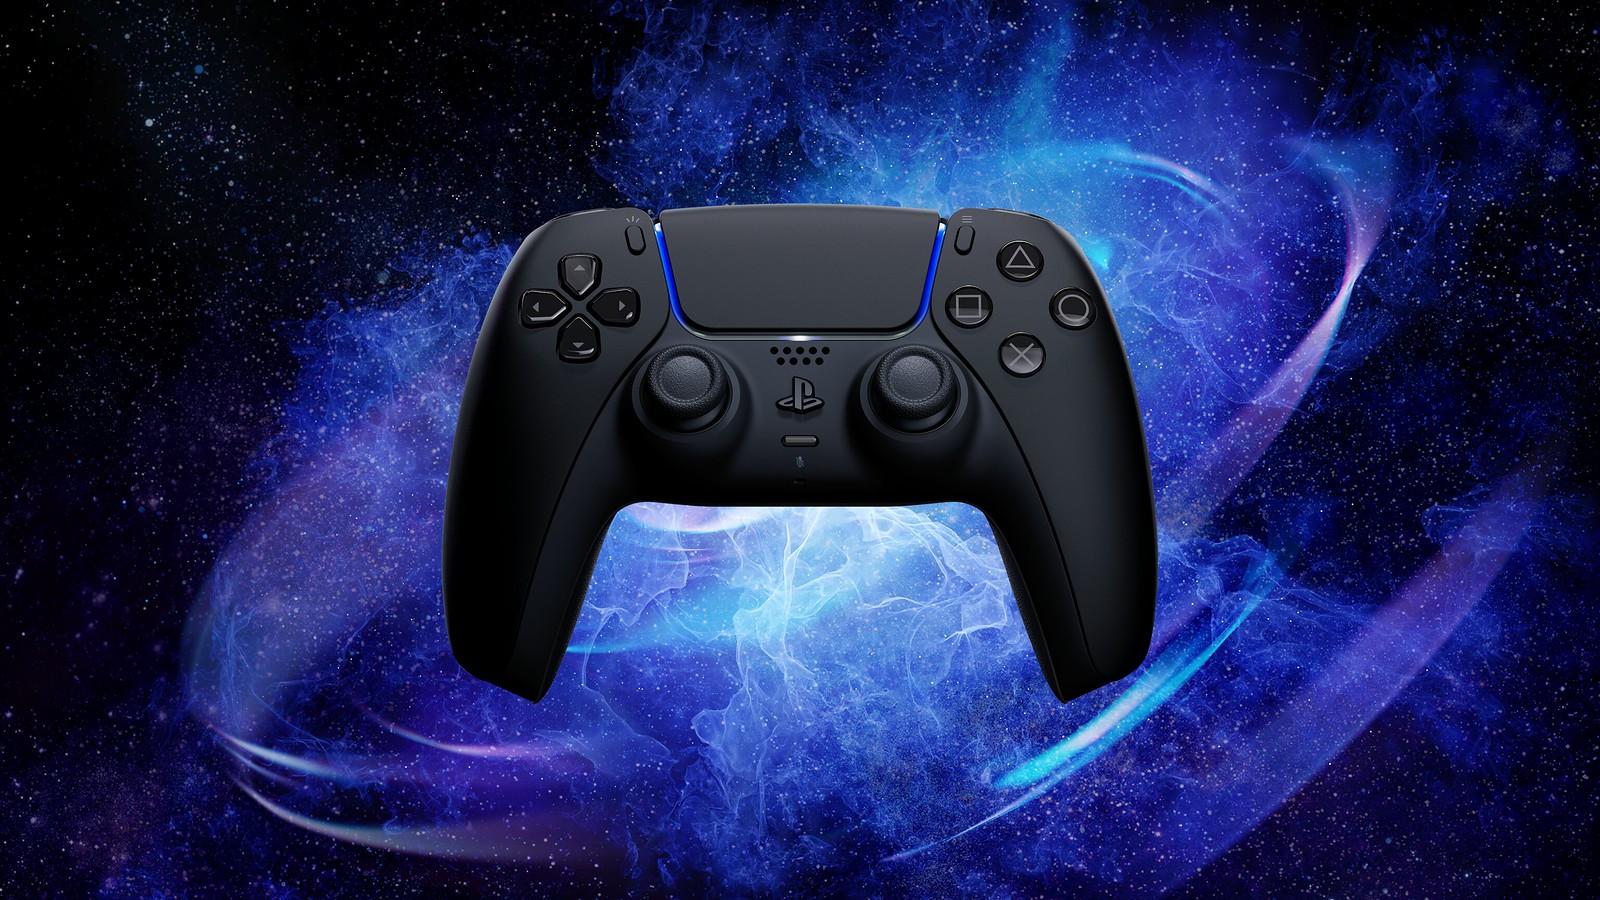 sony playstation 5 midnight black dualsense controller